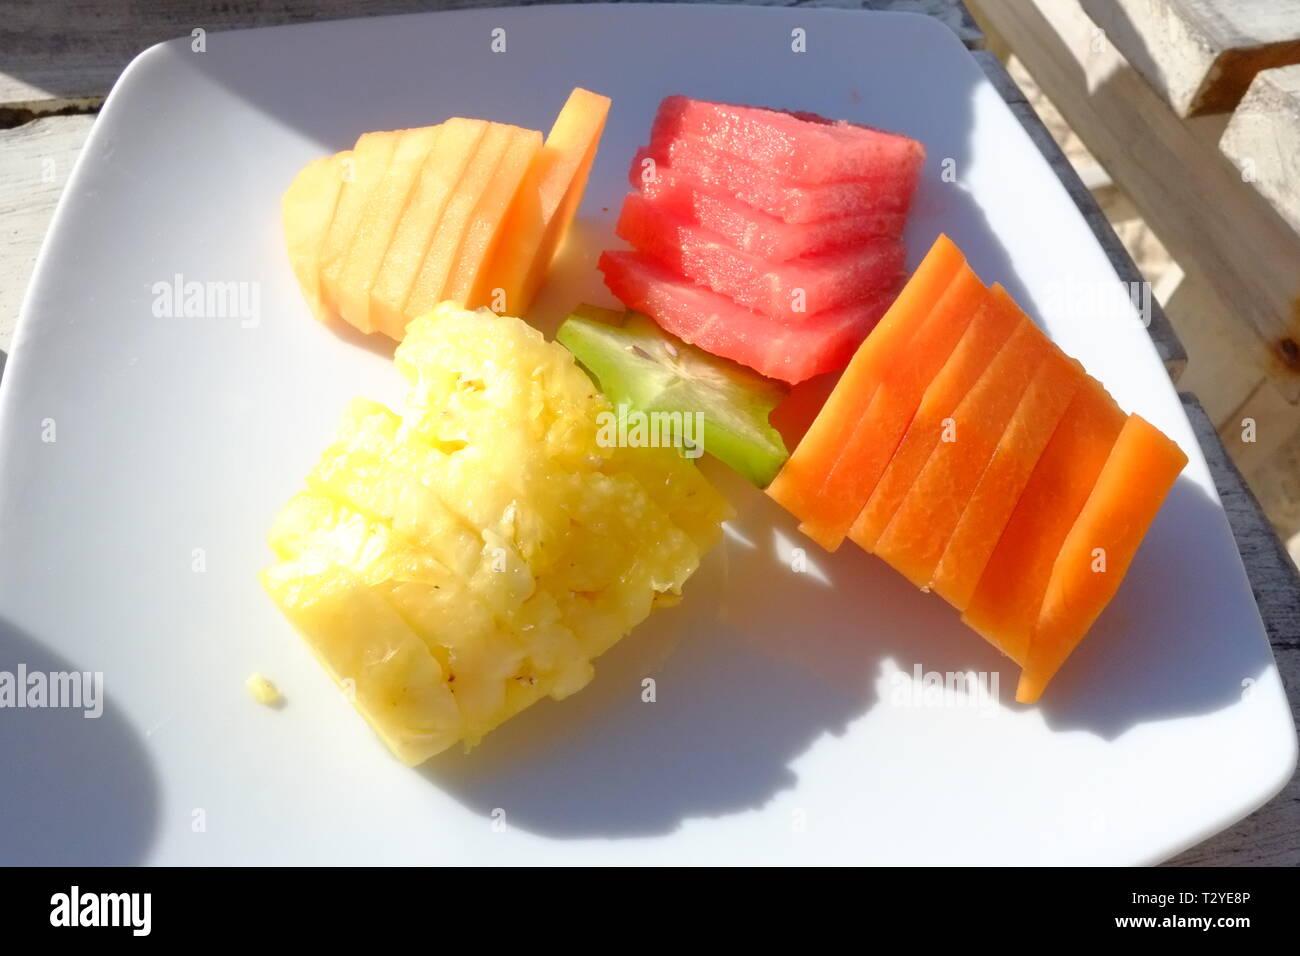 A Fruta Carambola Serve Para Que fruit, mango, pineapple, water melon and cantaloupe served